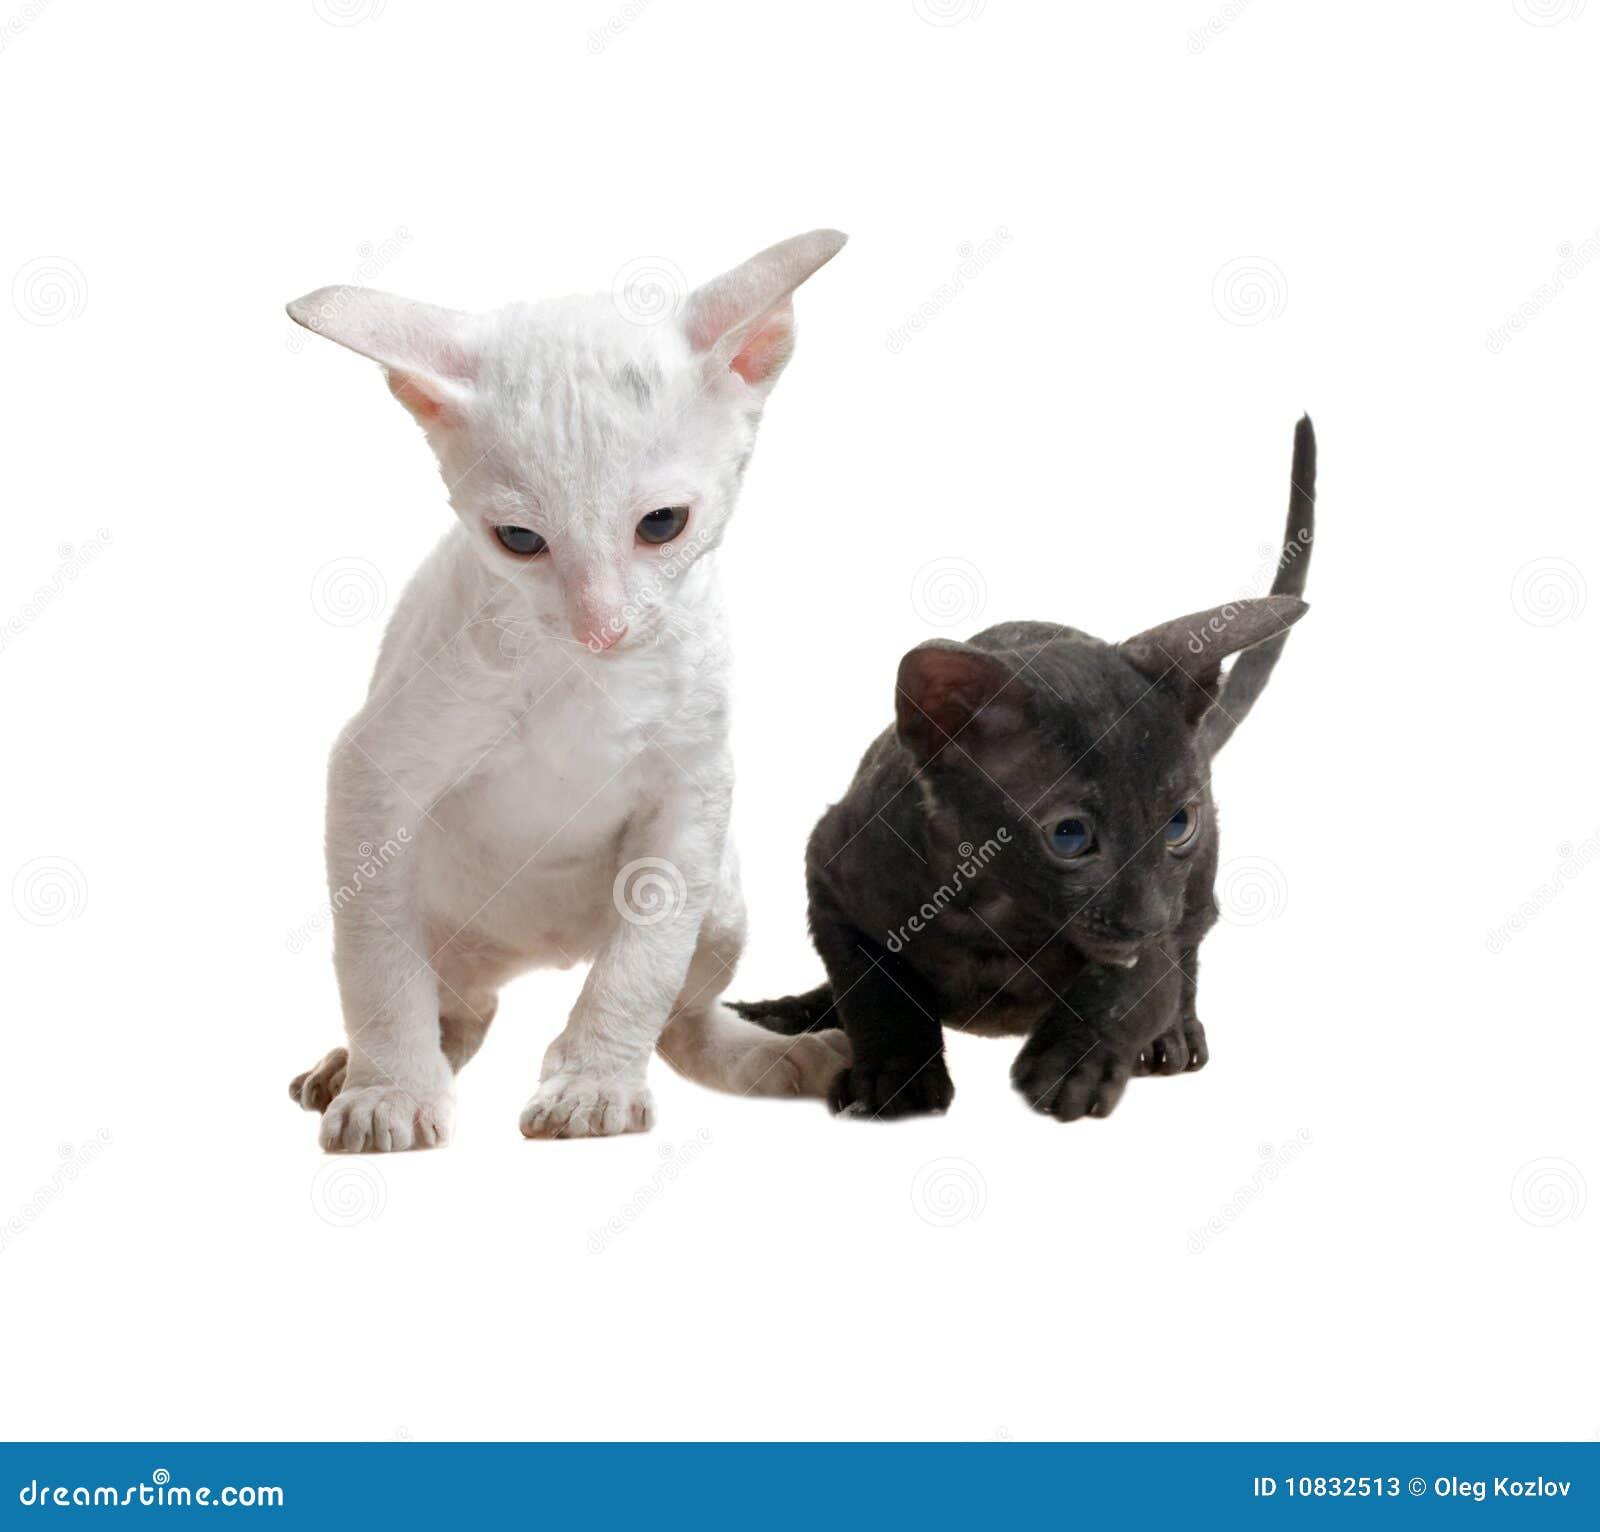 White And Black Cornish Rex Kittens Stock s Image